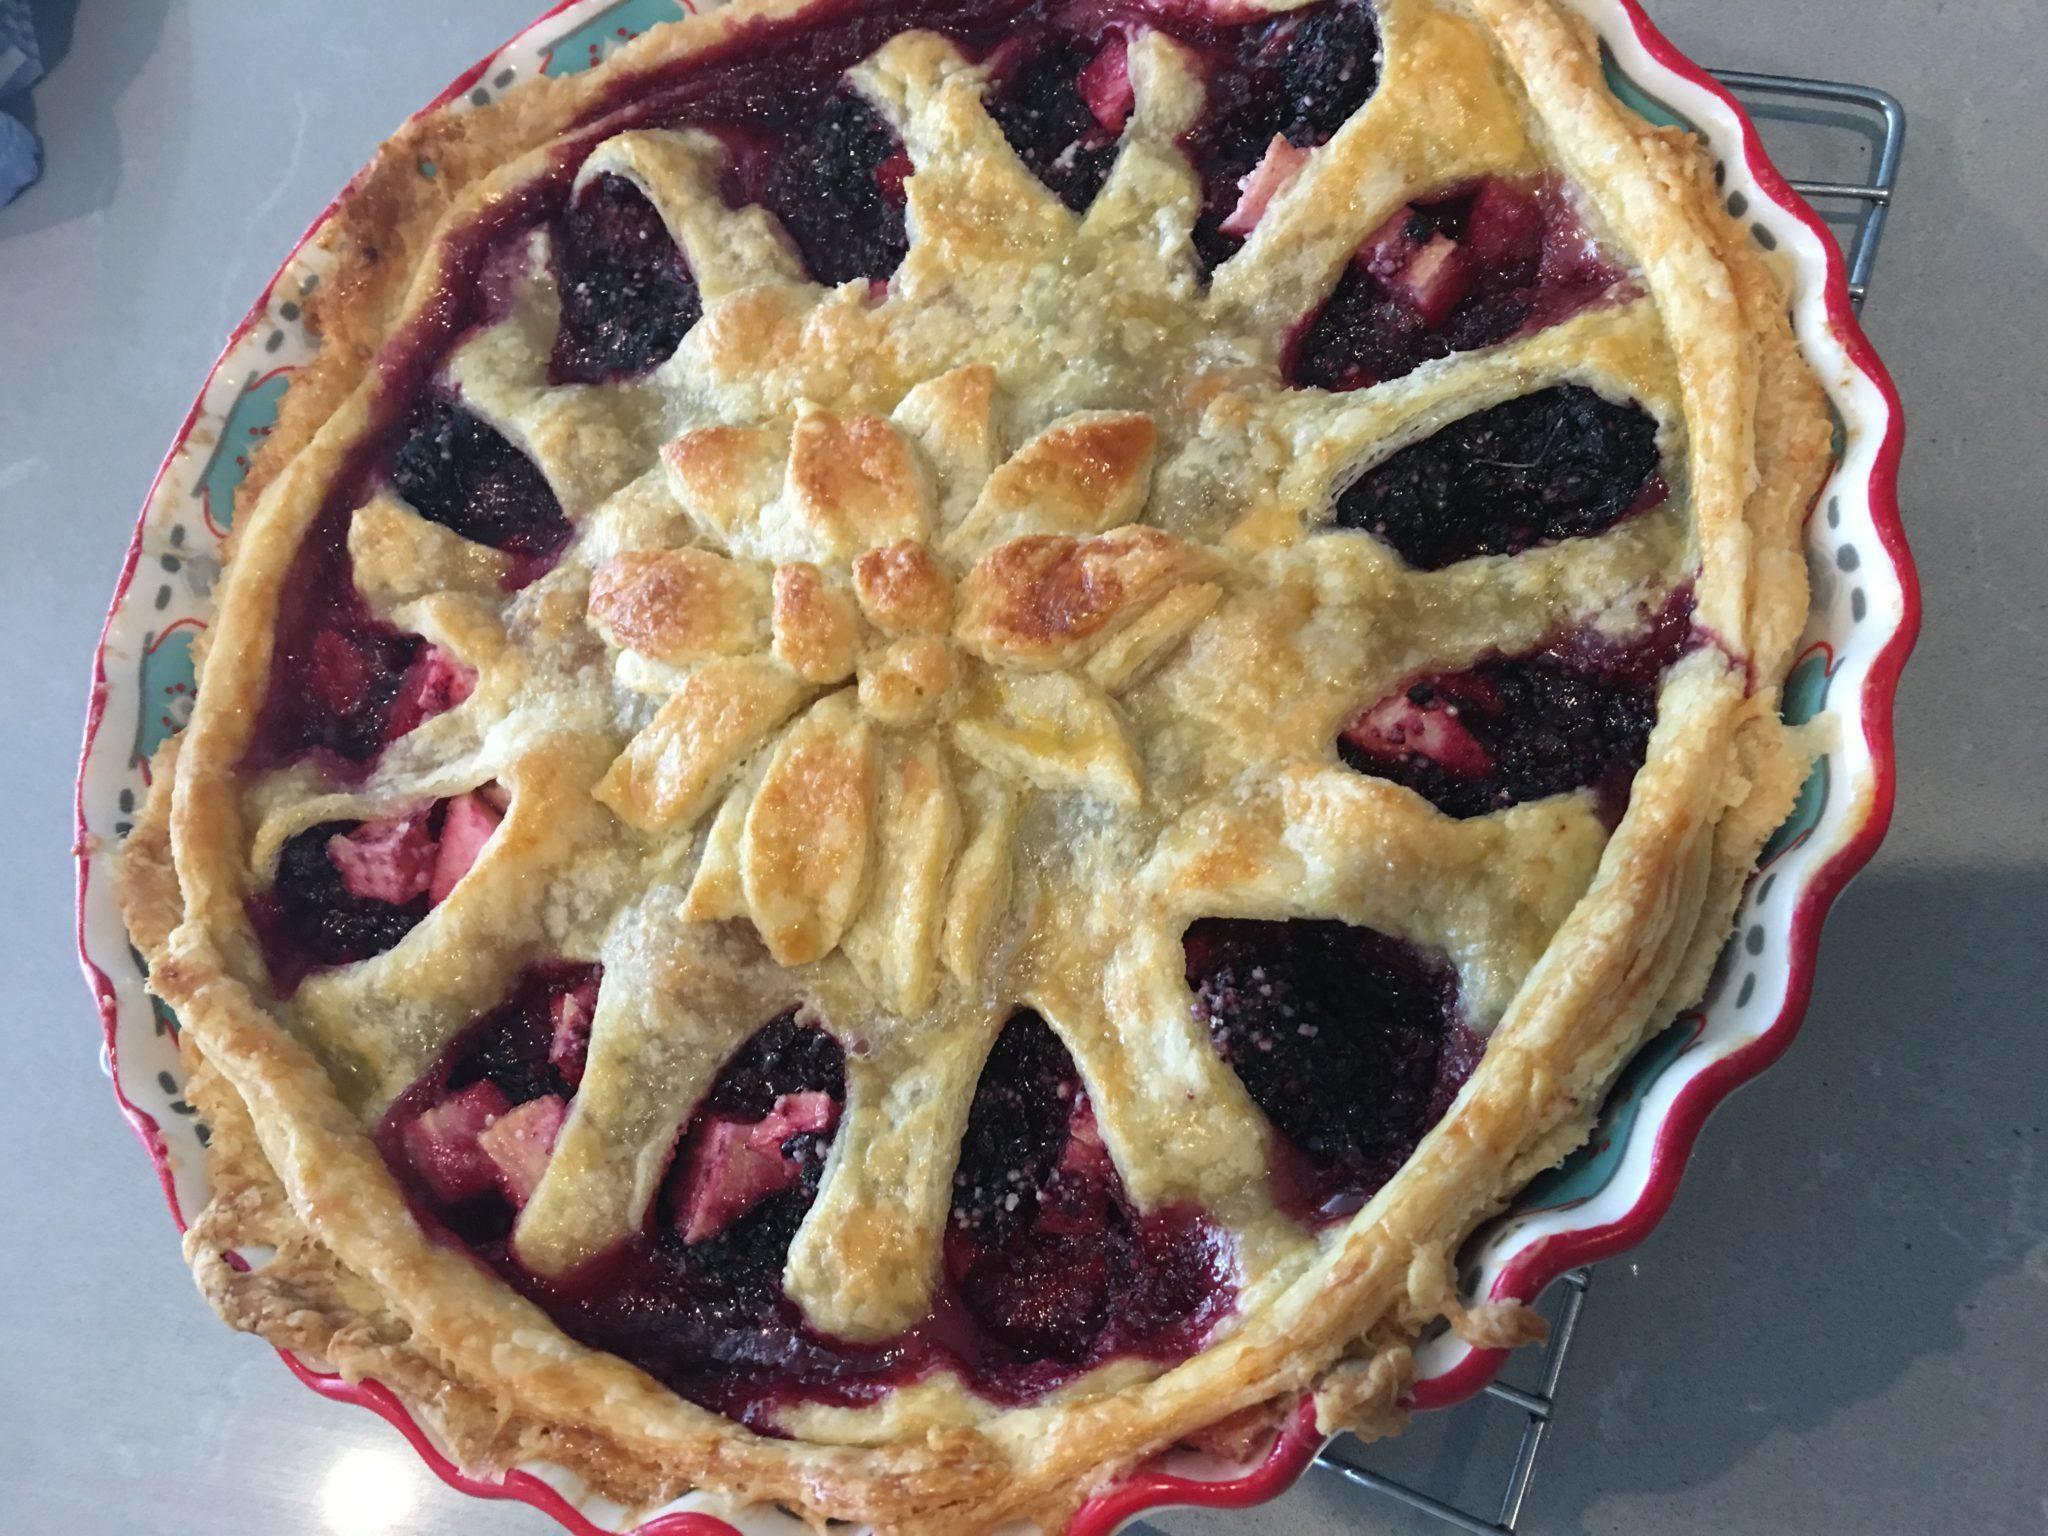 Pear-Blackberry pie with decorative crust